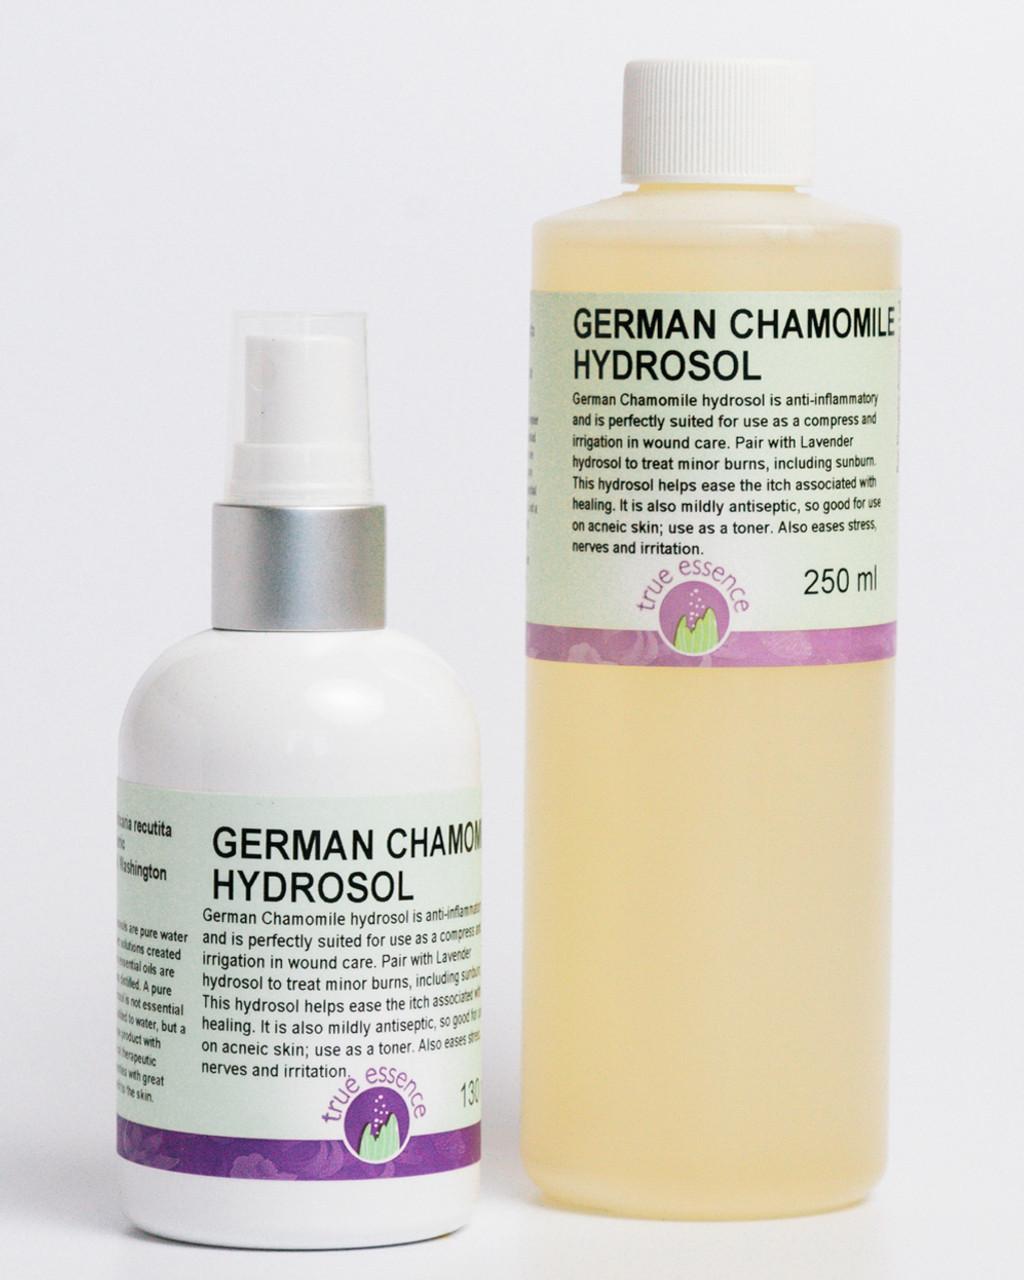 GERMAN CHAMOMILE (Matricaria recutita) Hydrosol